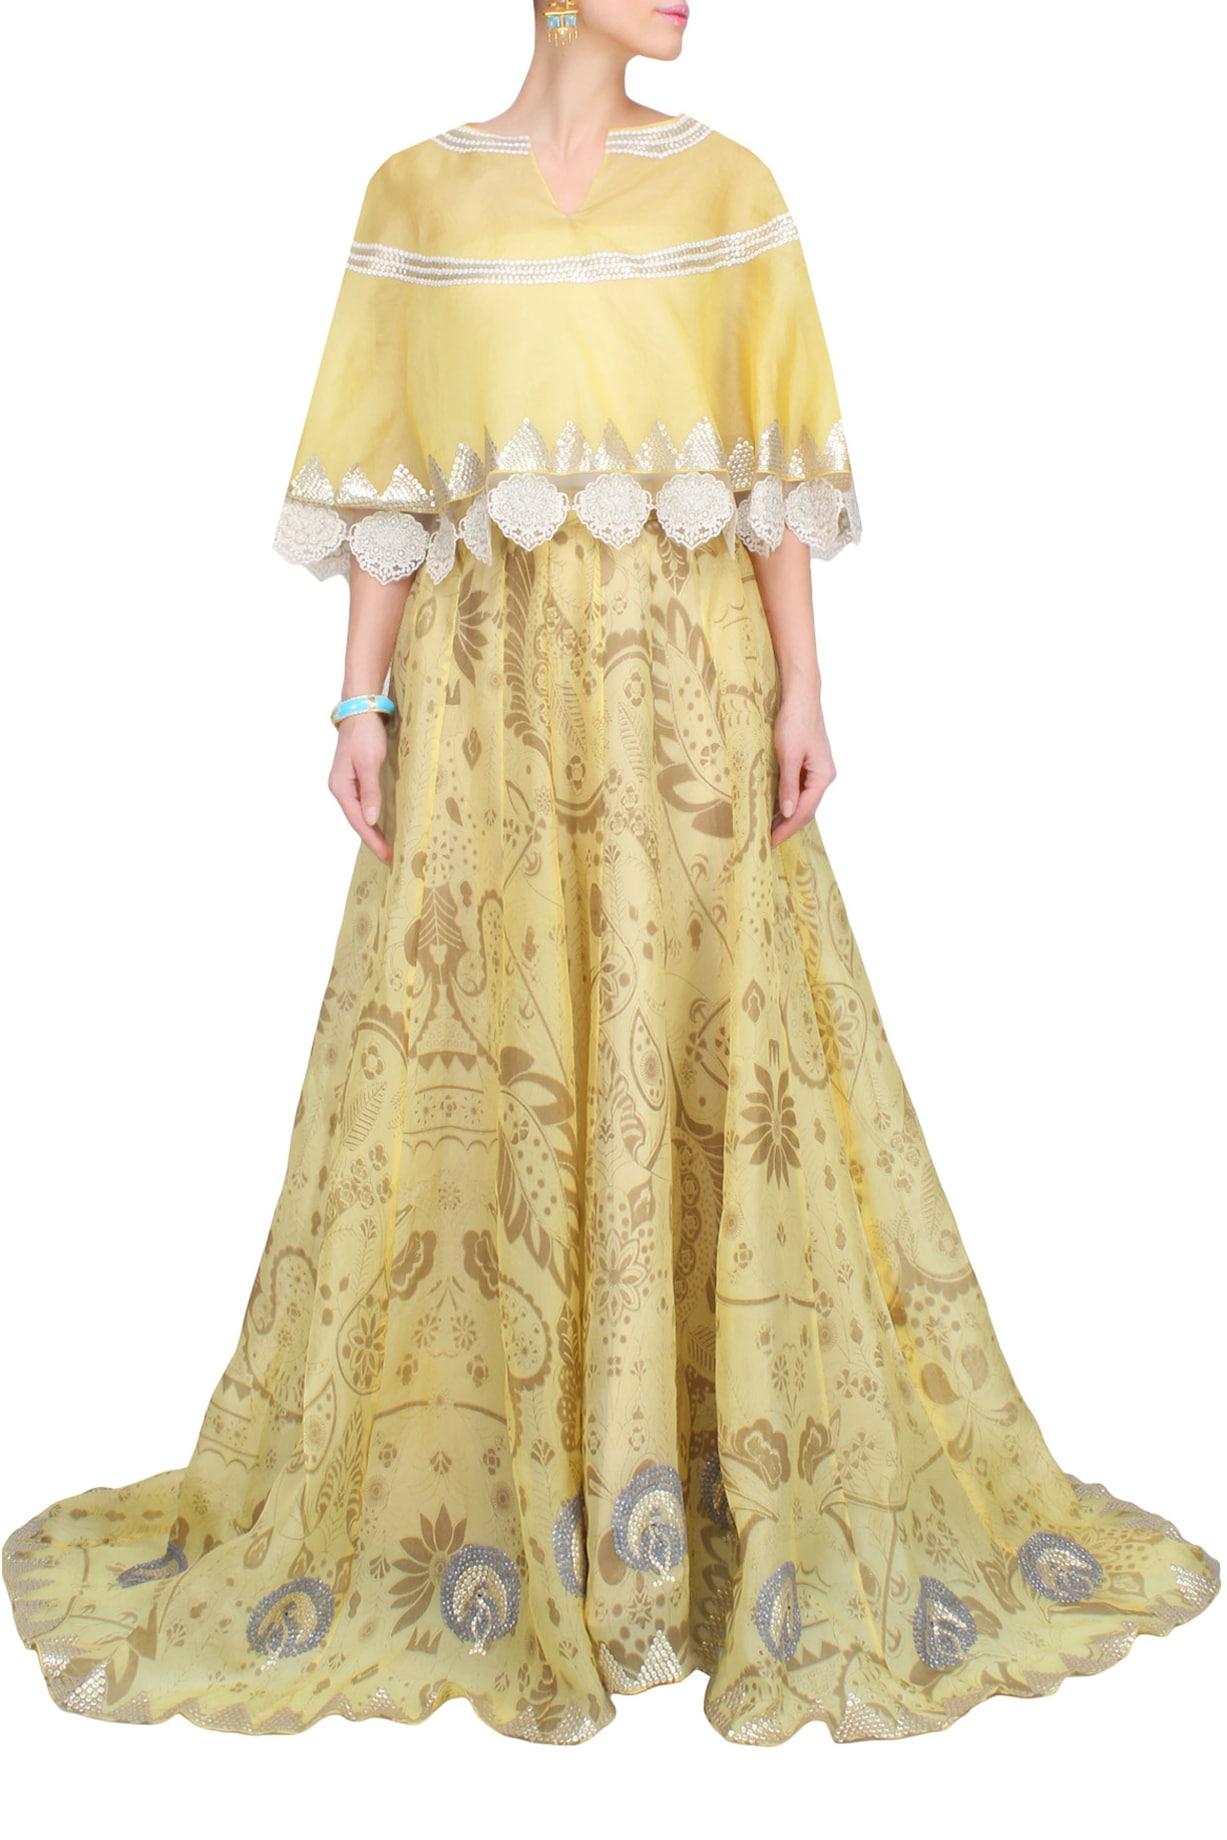 Jade by Monica and Karishma Skirts